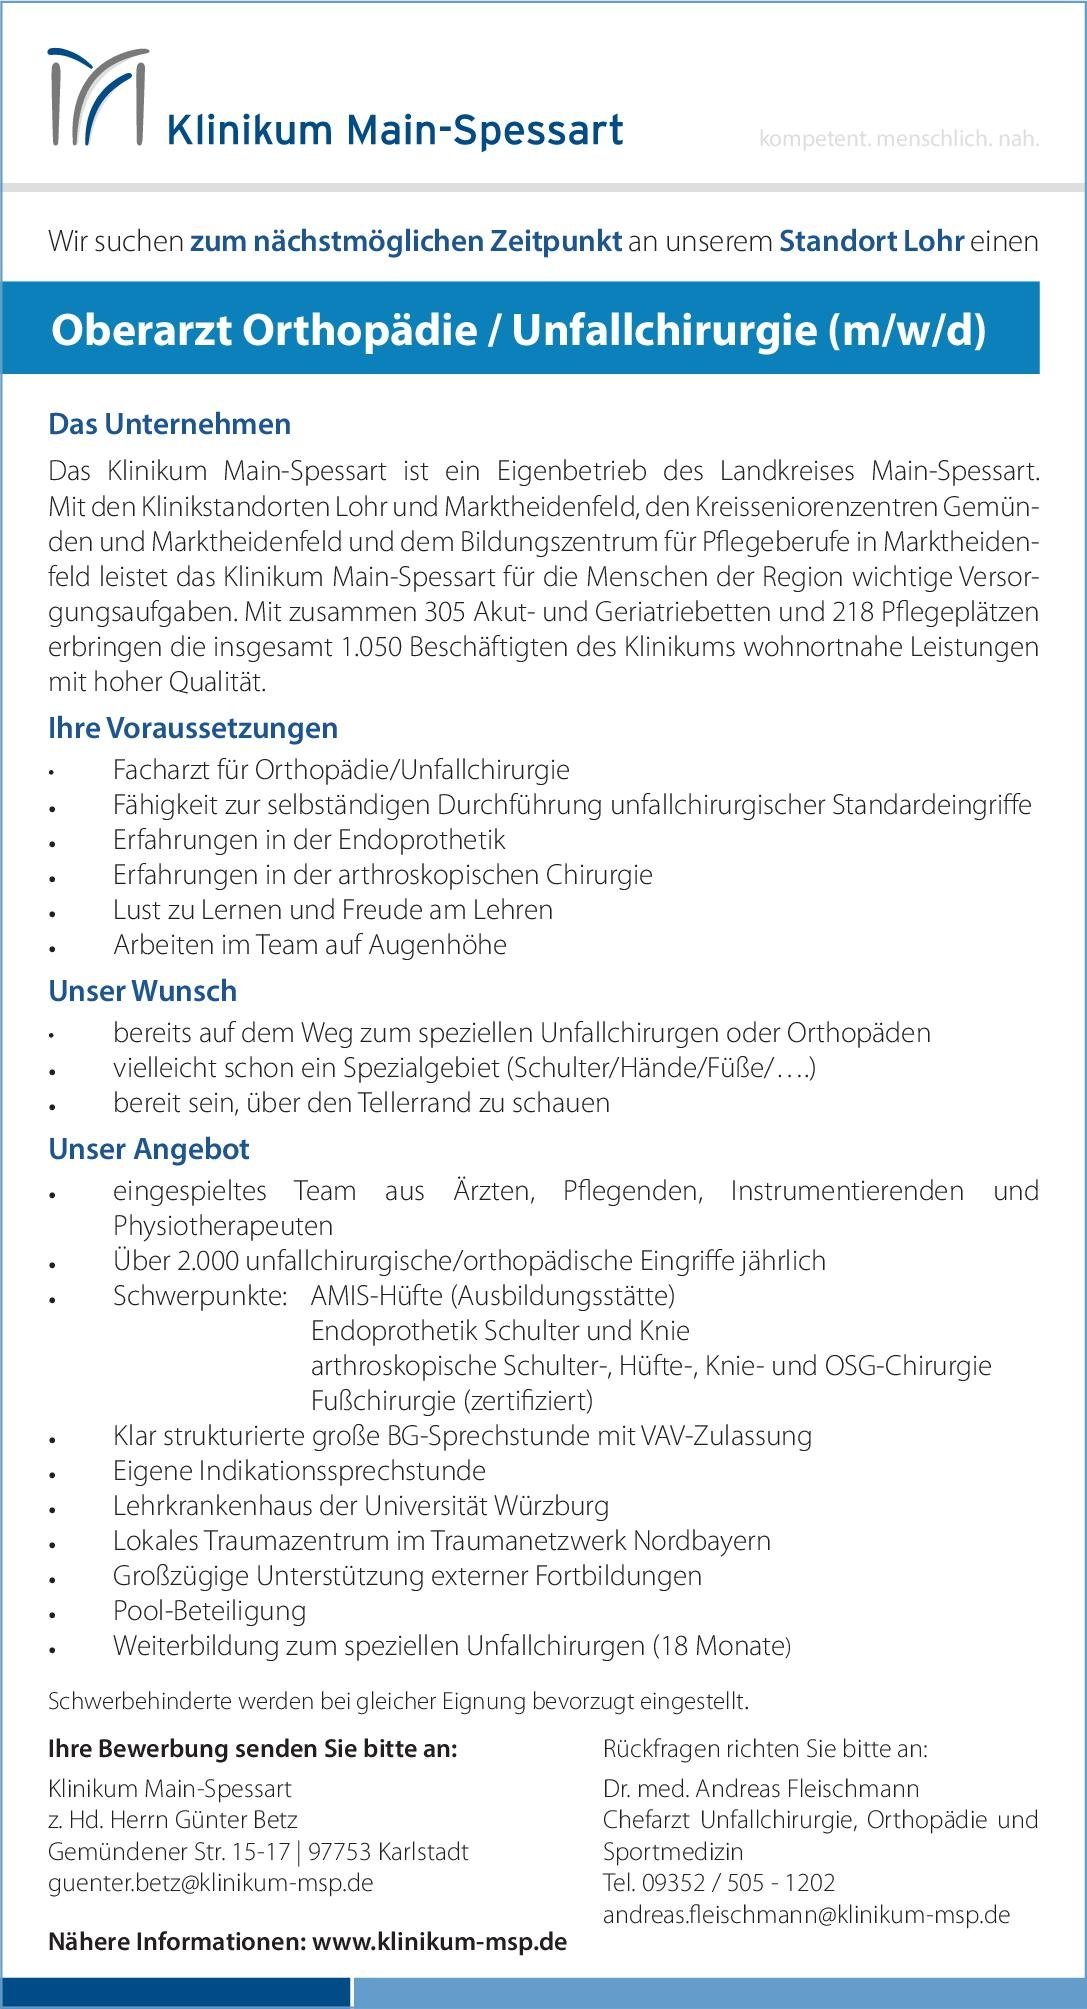 Klinikum Main-Spessart Oberarzt Orthopädie / Unfallchirurgie (w/m/d)  Orthopädie und Unfallchirurgie, Chirurgie Oberarzt